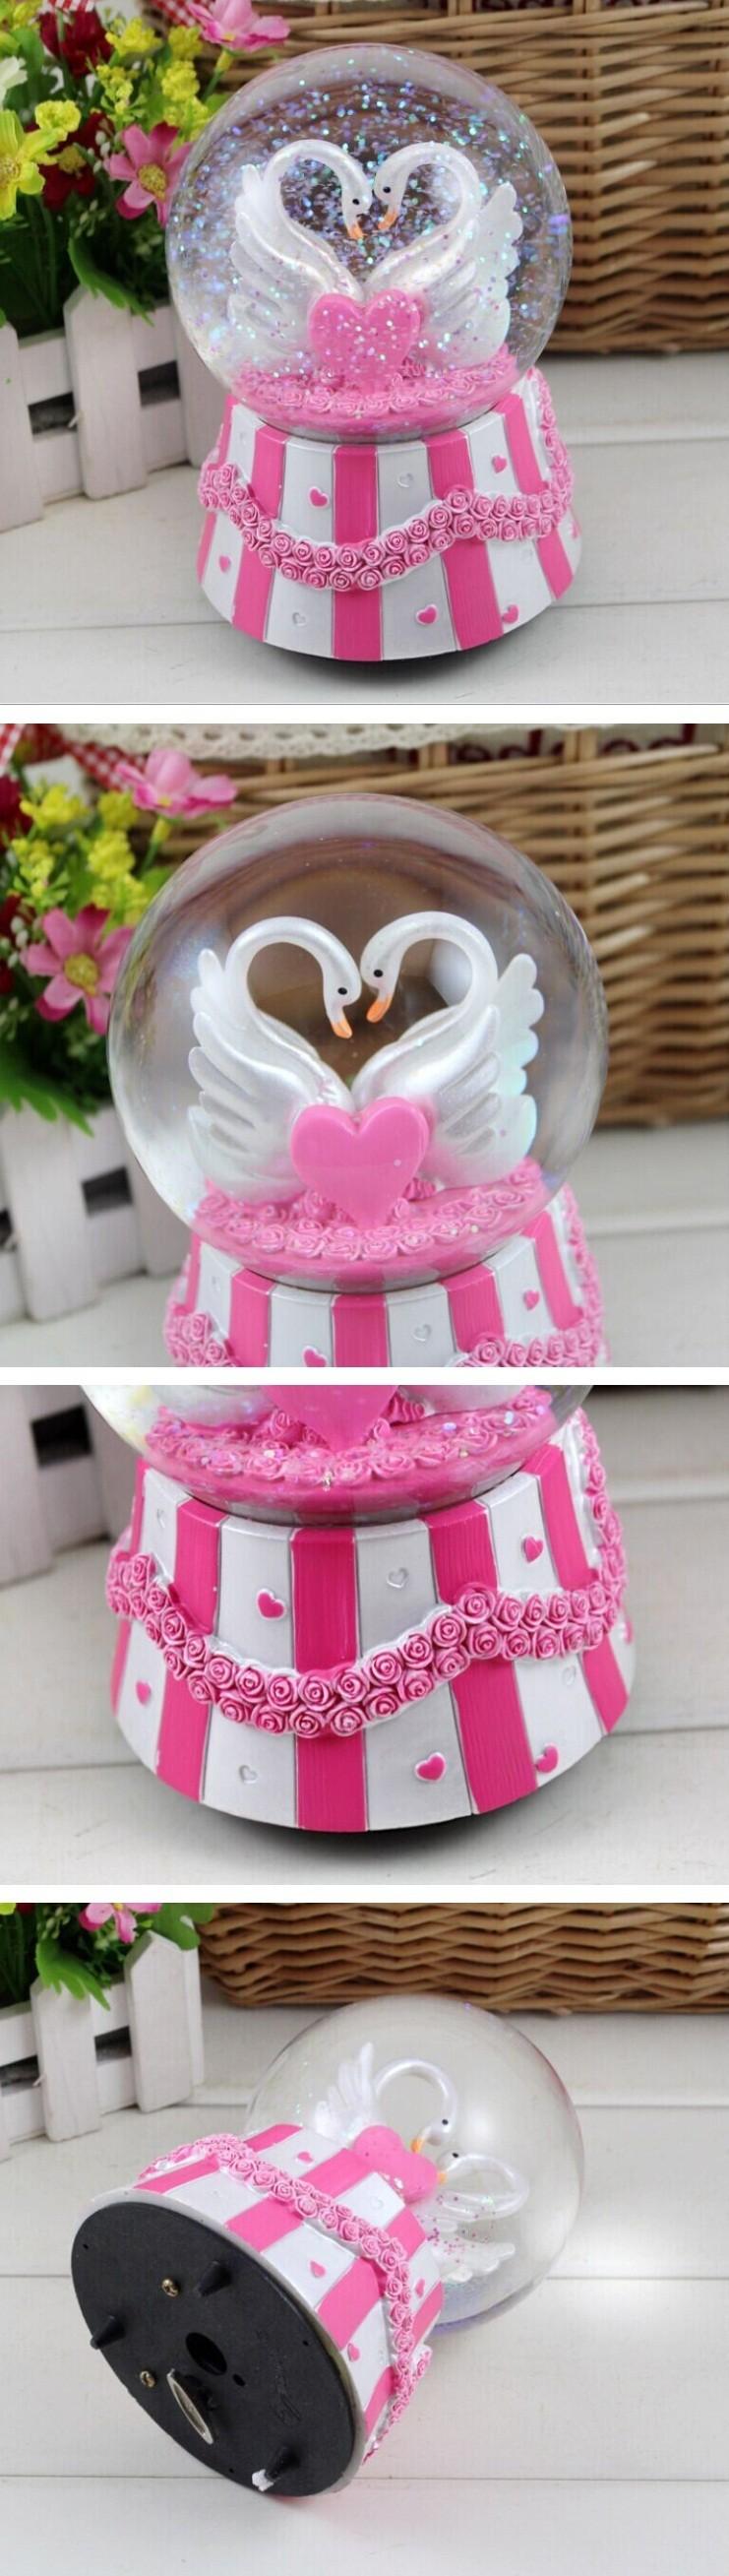 Swan lovers heart music box crystal ball snow globe rotation ...